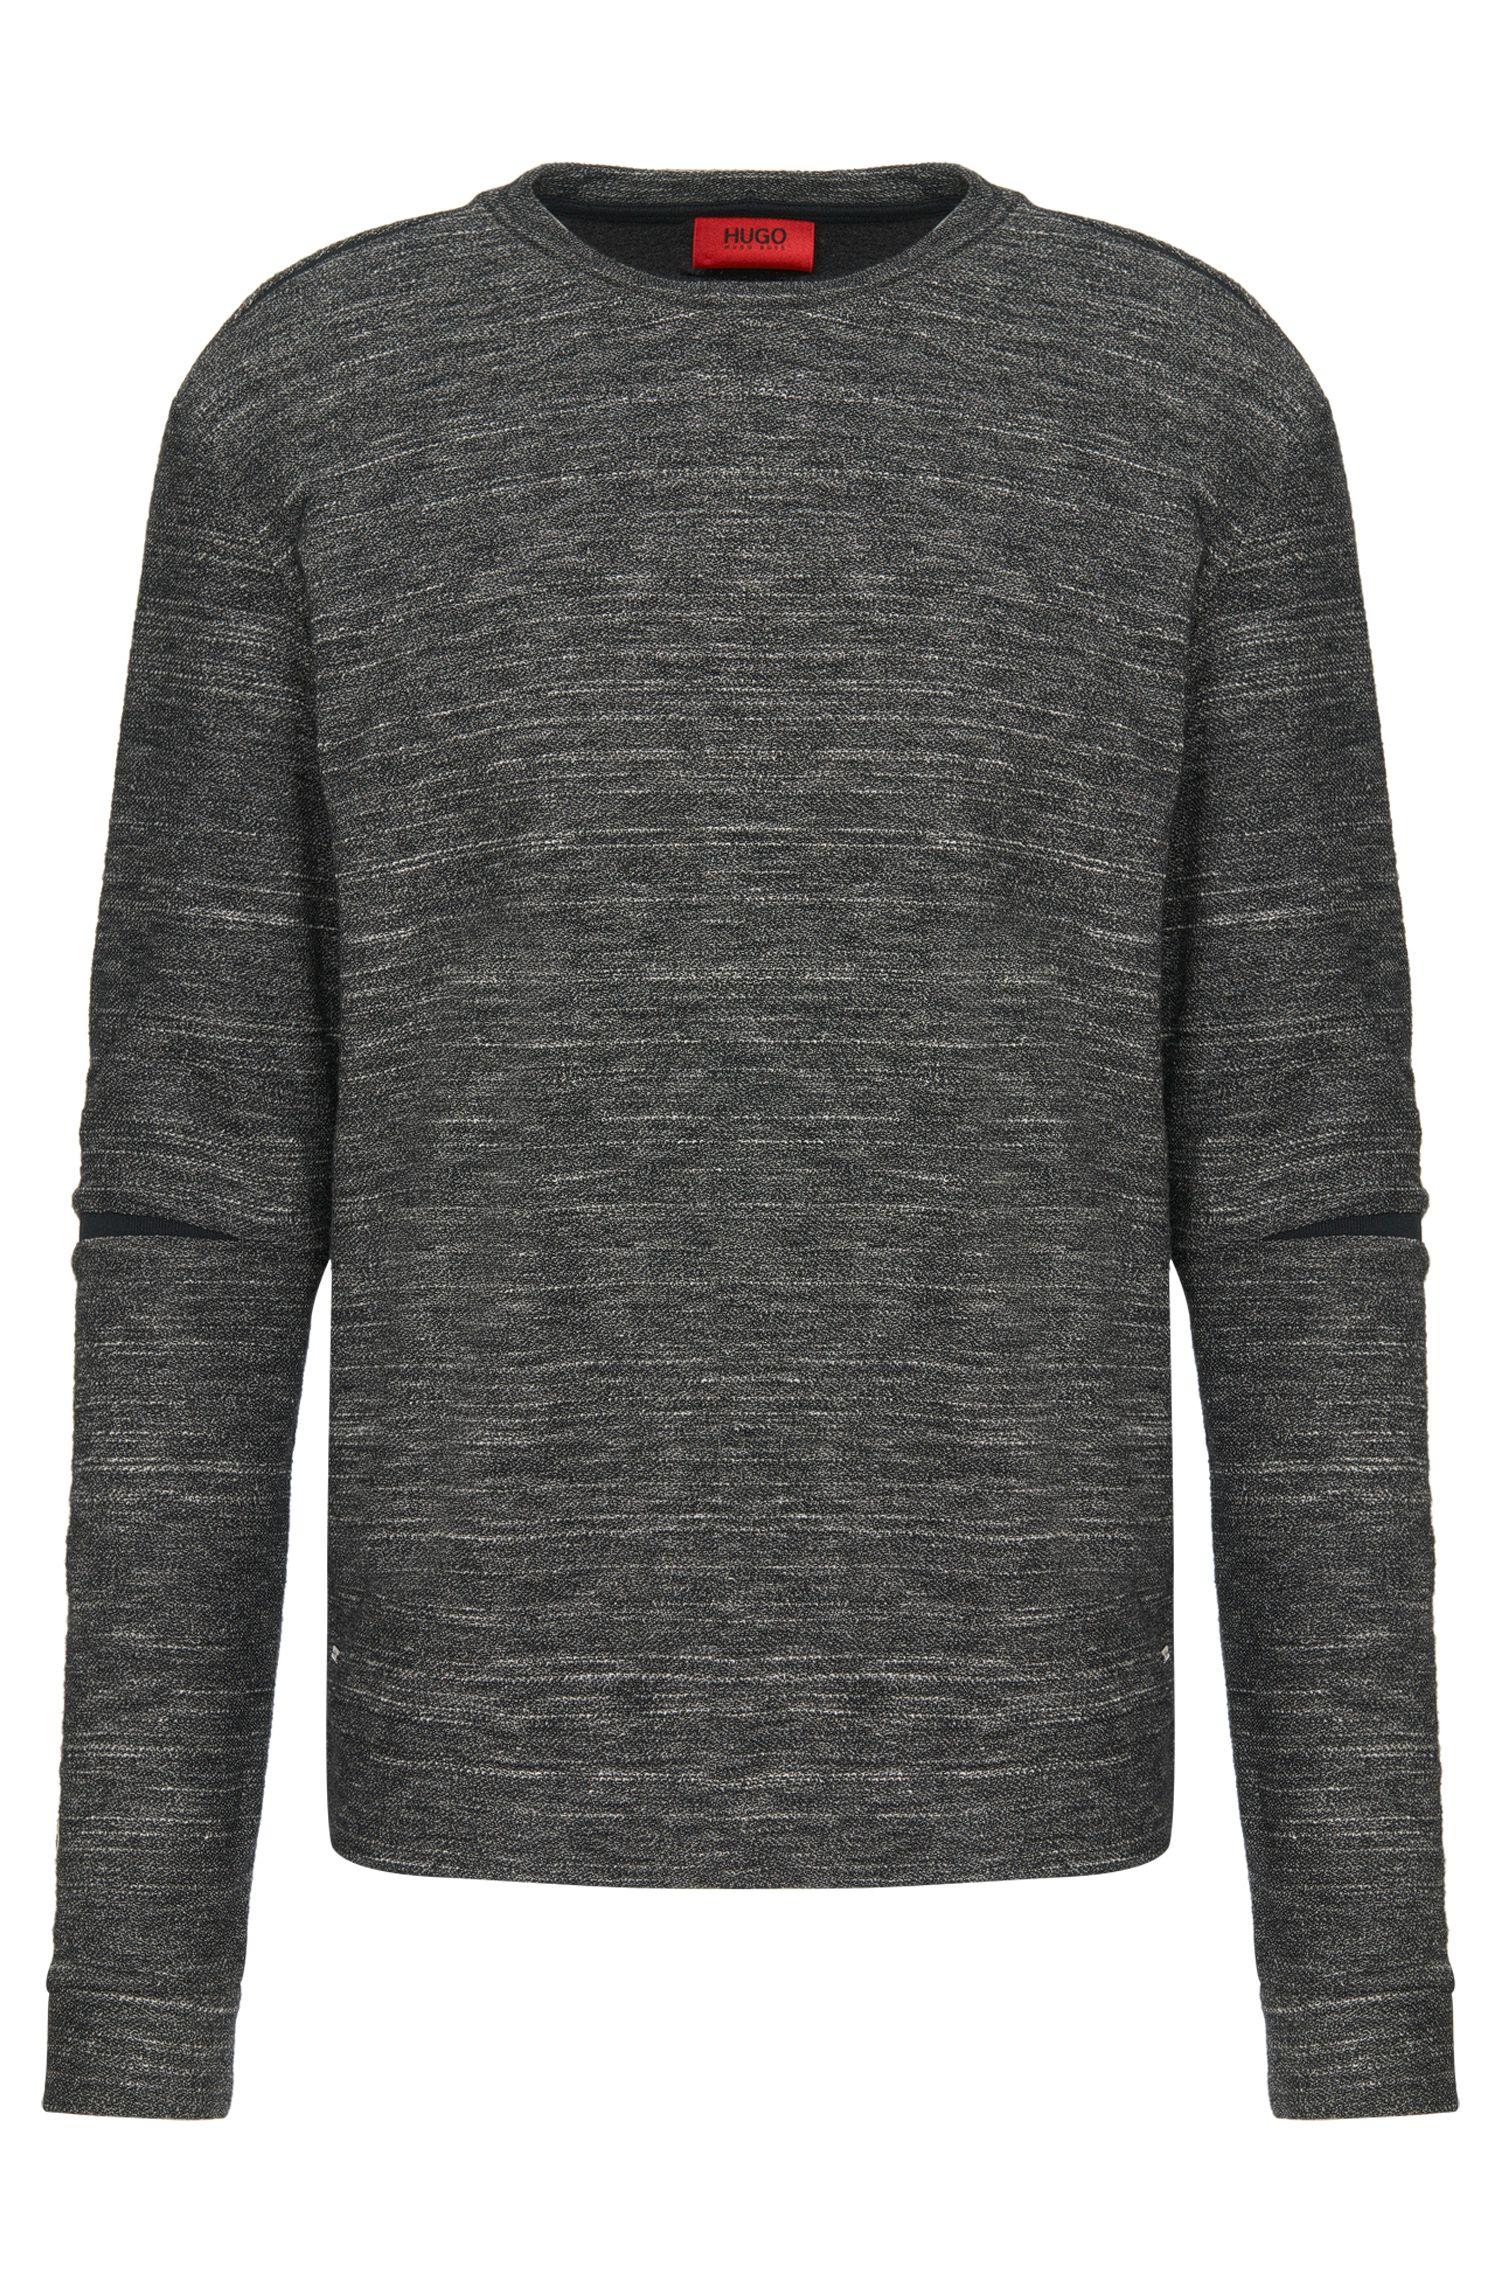 'Daetano' | Cotton Wool Blend Split-Seam Sweatshirt